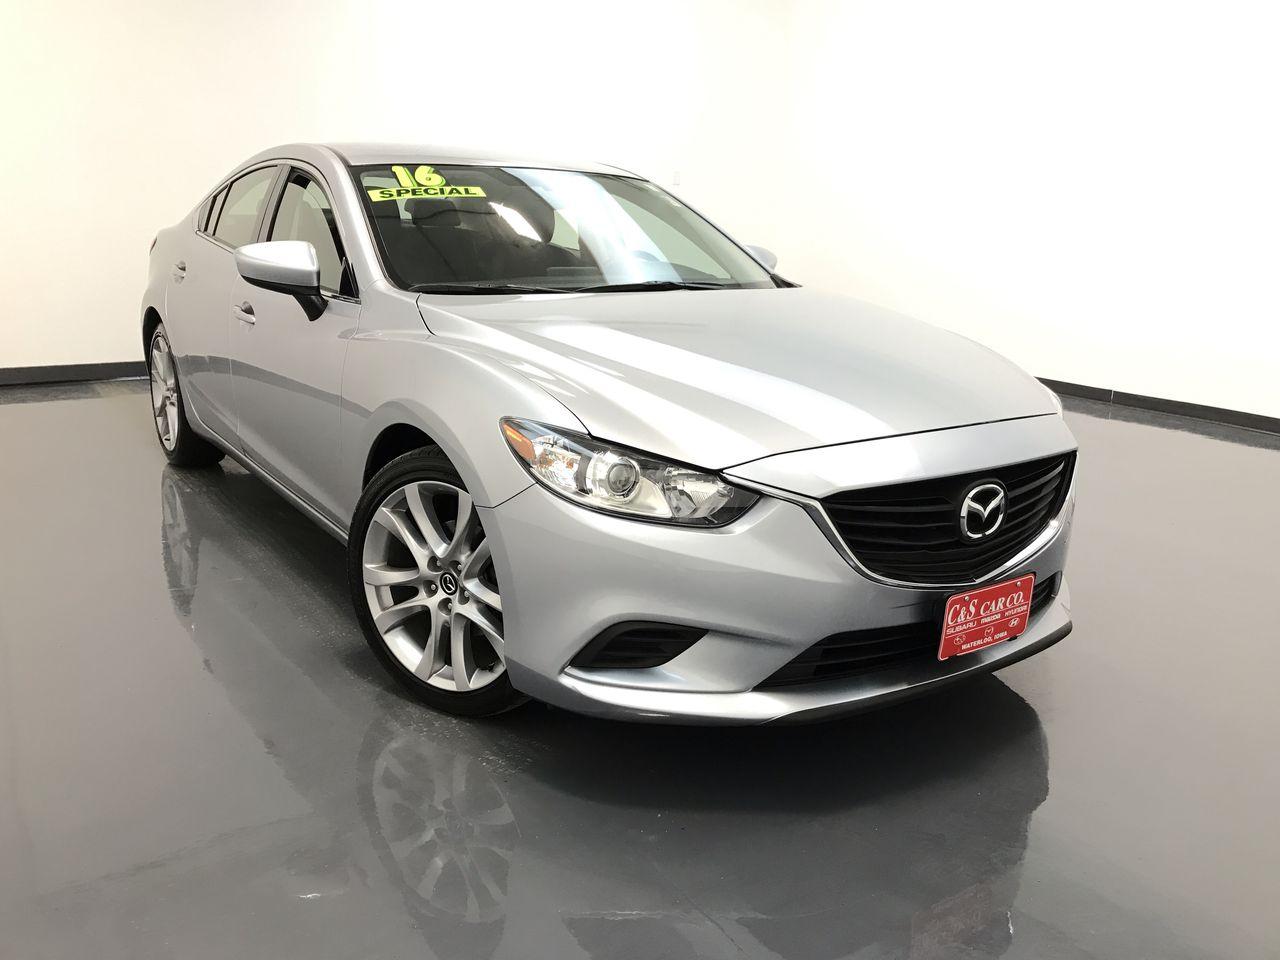 2016 Mazda Mazda6 i Touring  - SB7704B  - C & S Car Company